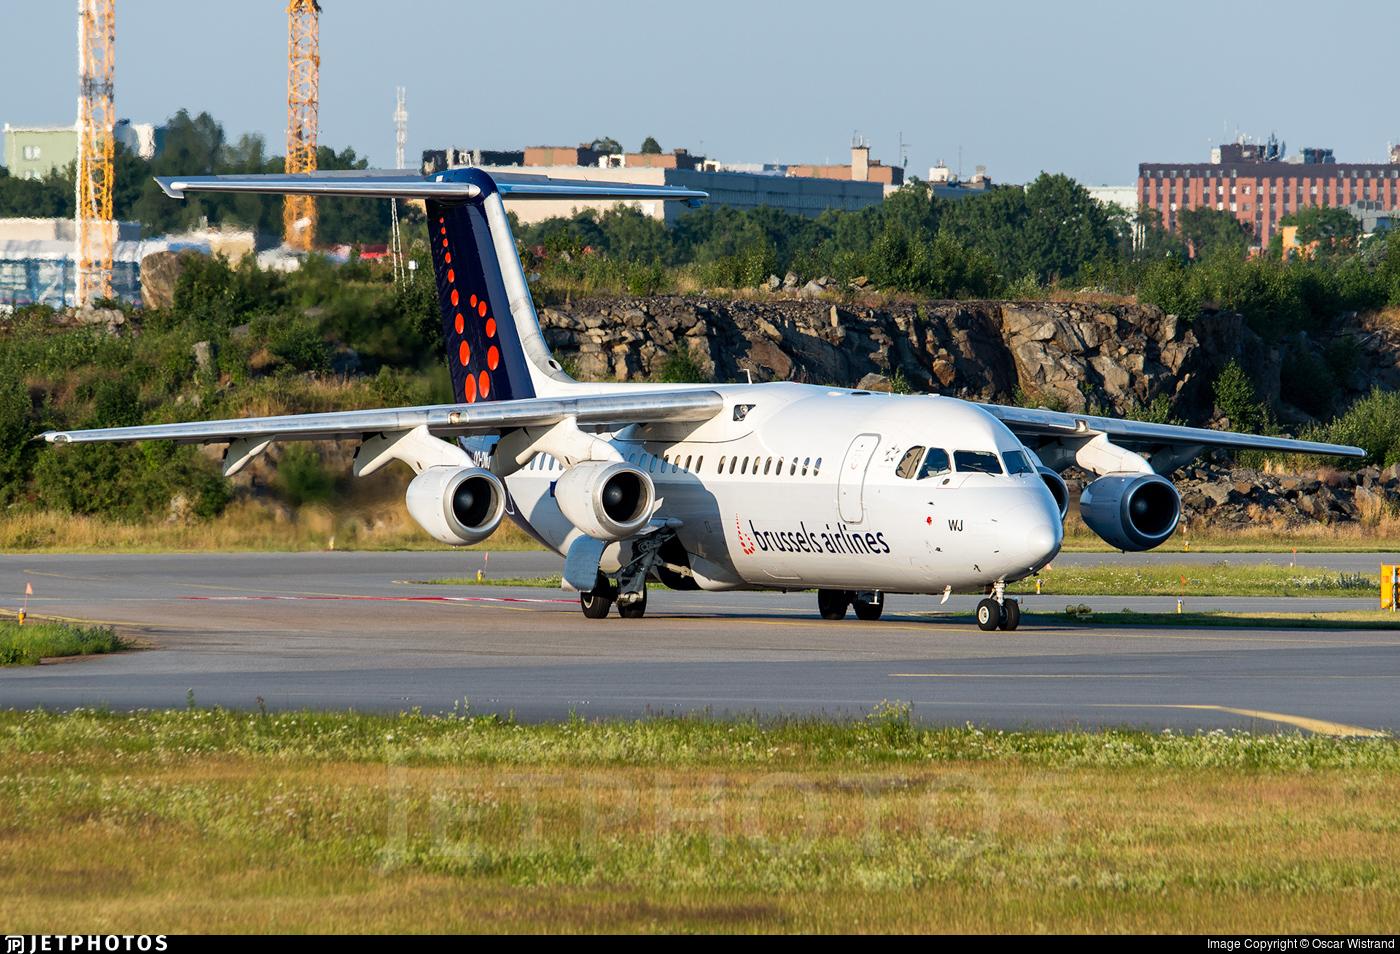 OO-DWJ - British Aerospace Avro RJ100 - Brussels Airlines